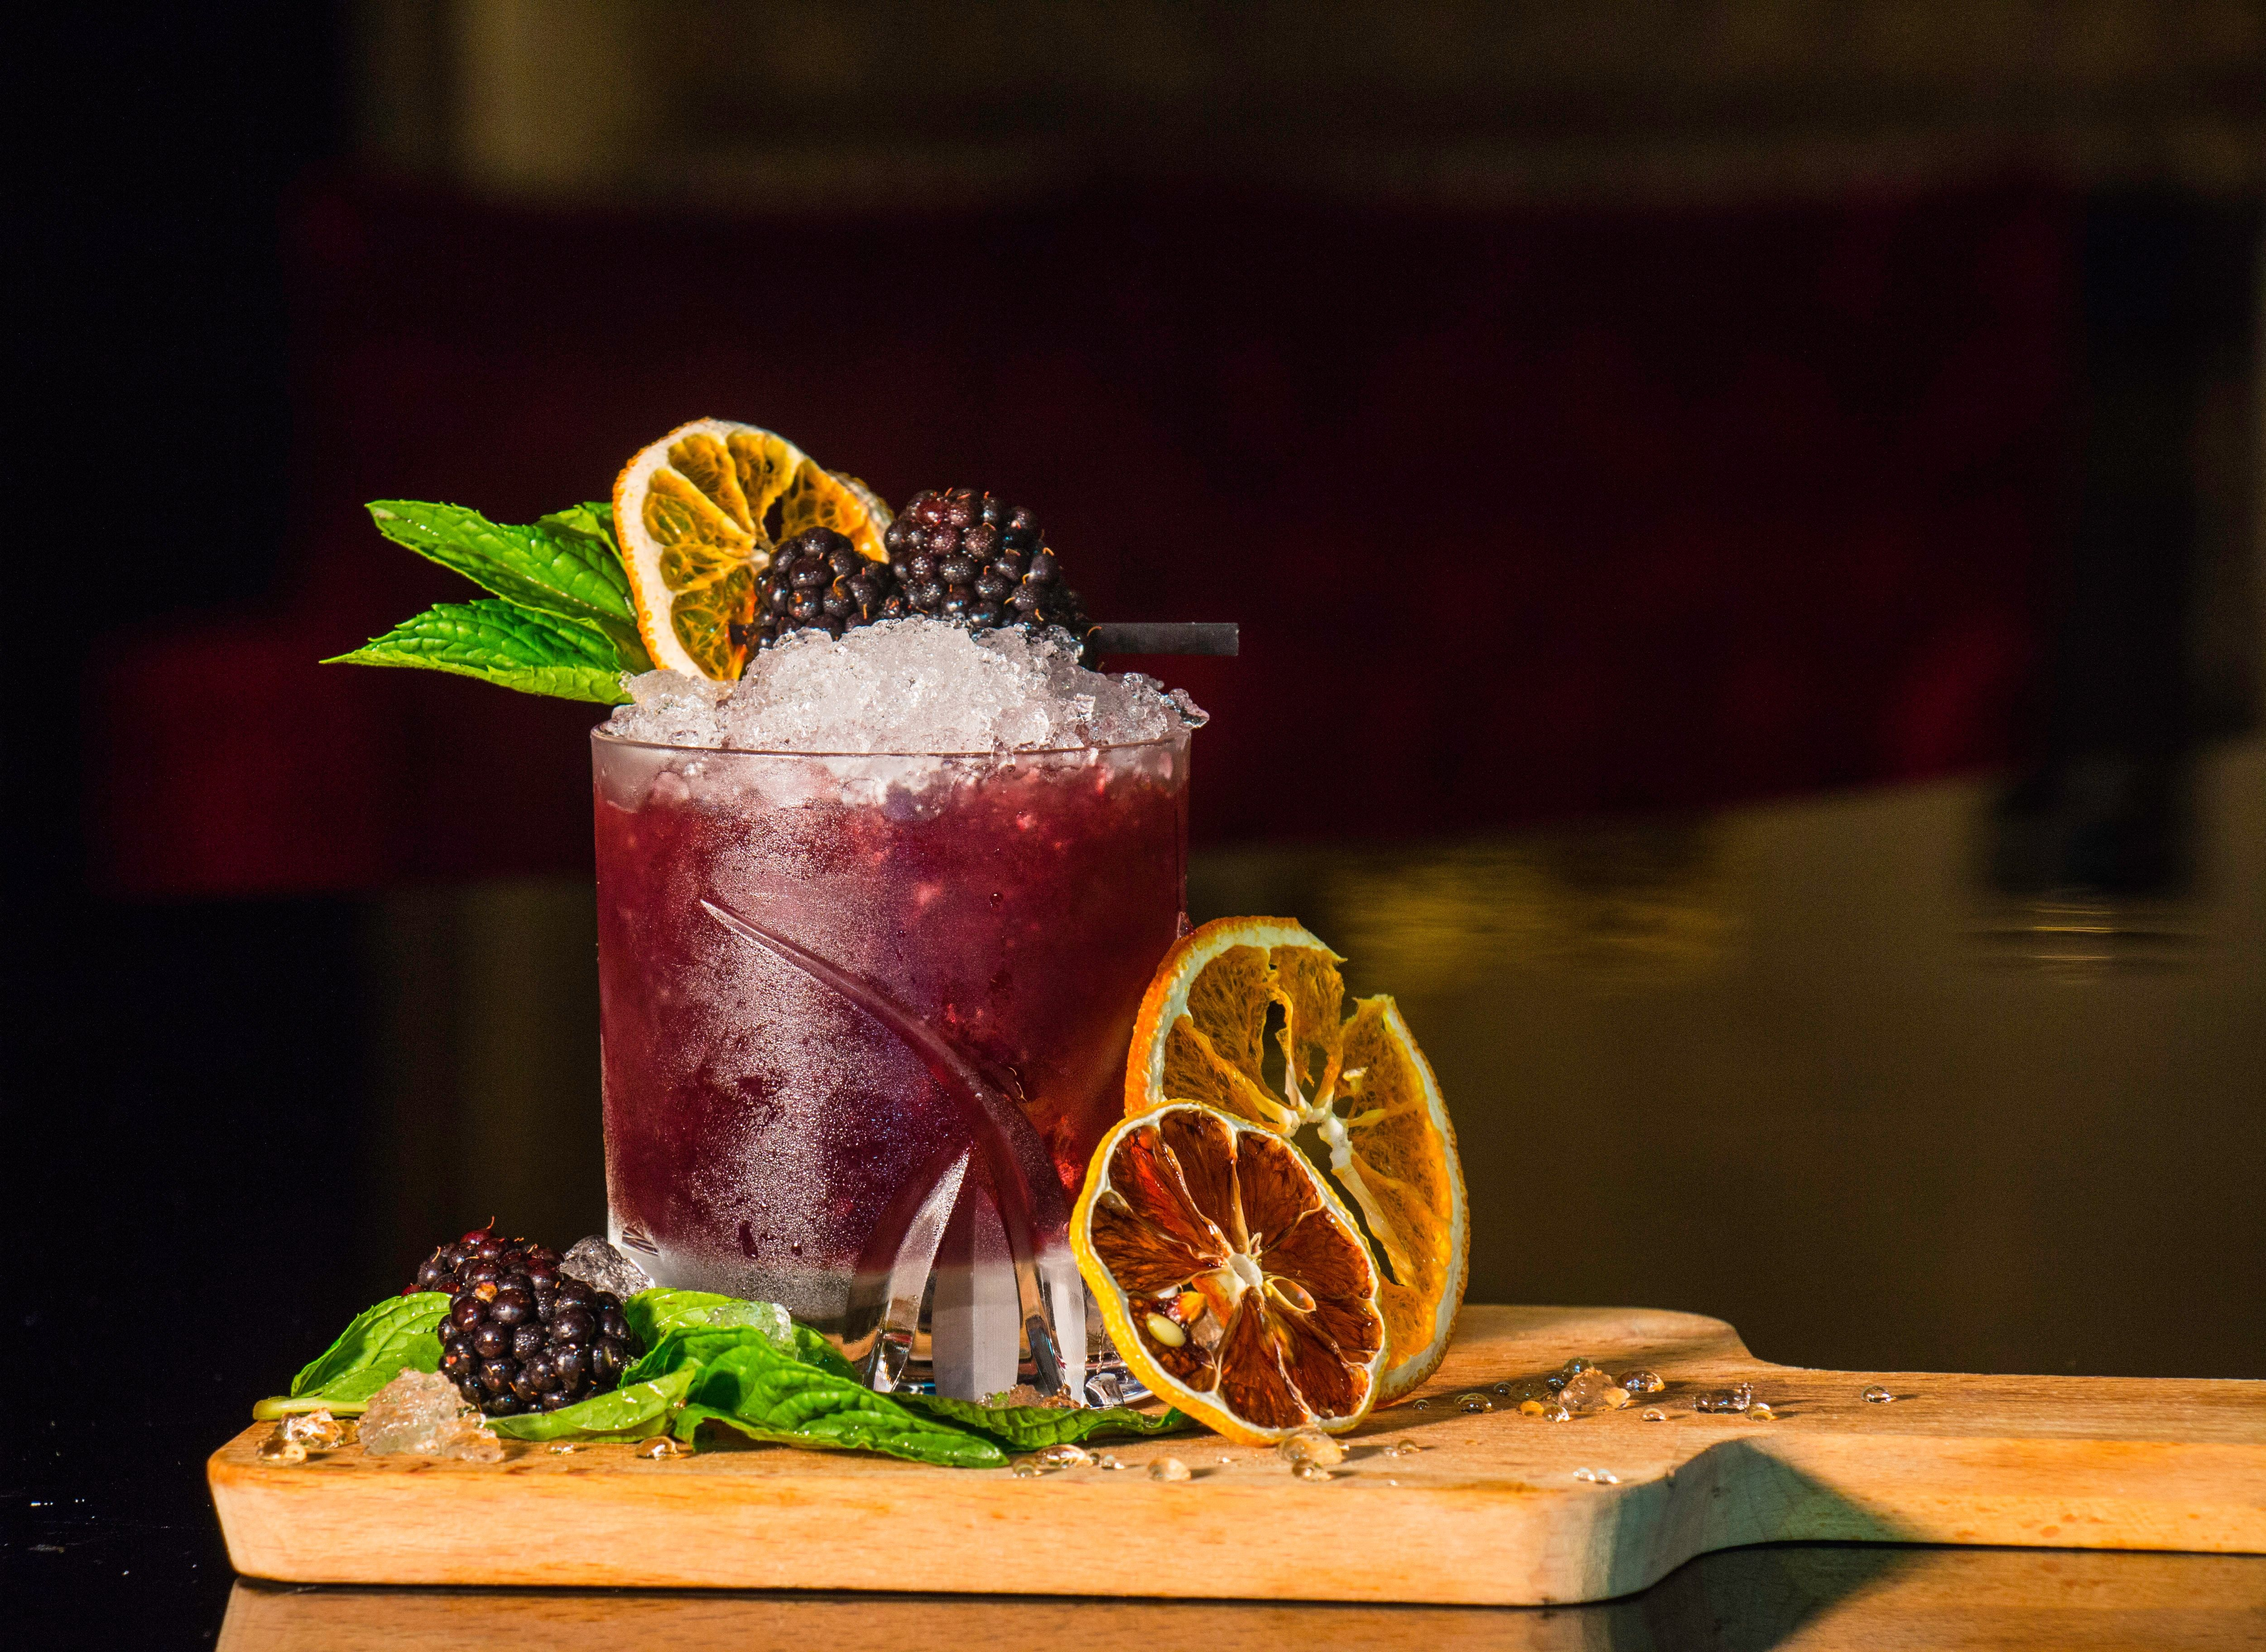 Berry_cocktail_kyryll-ushakov-lwotubyiuc4-unsplash